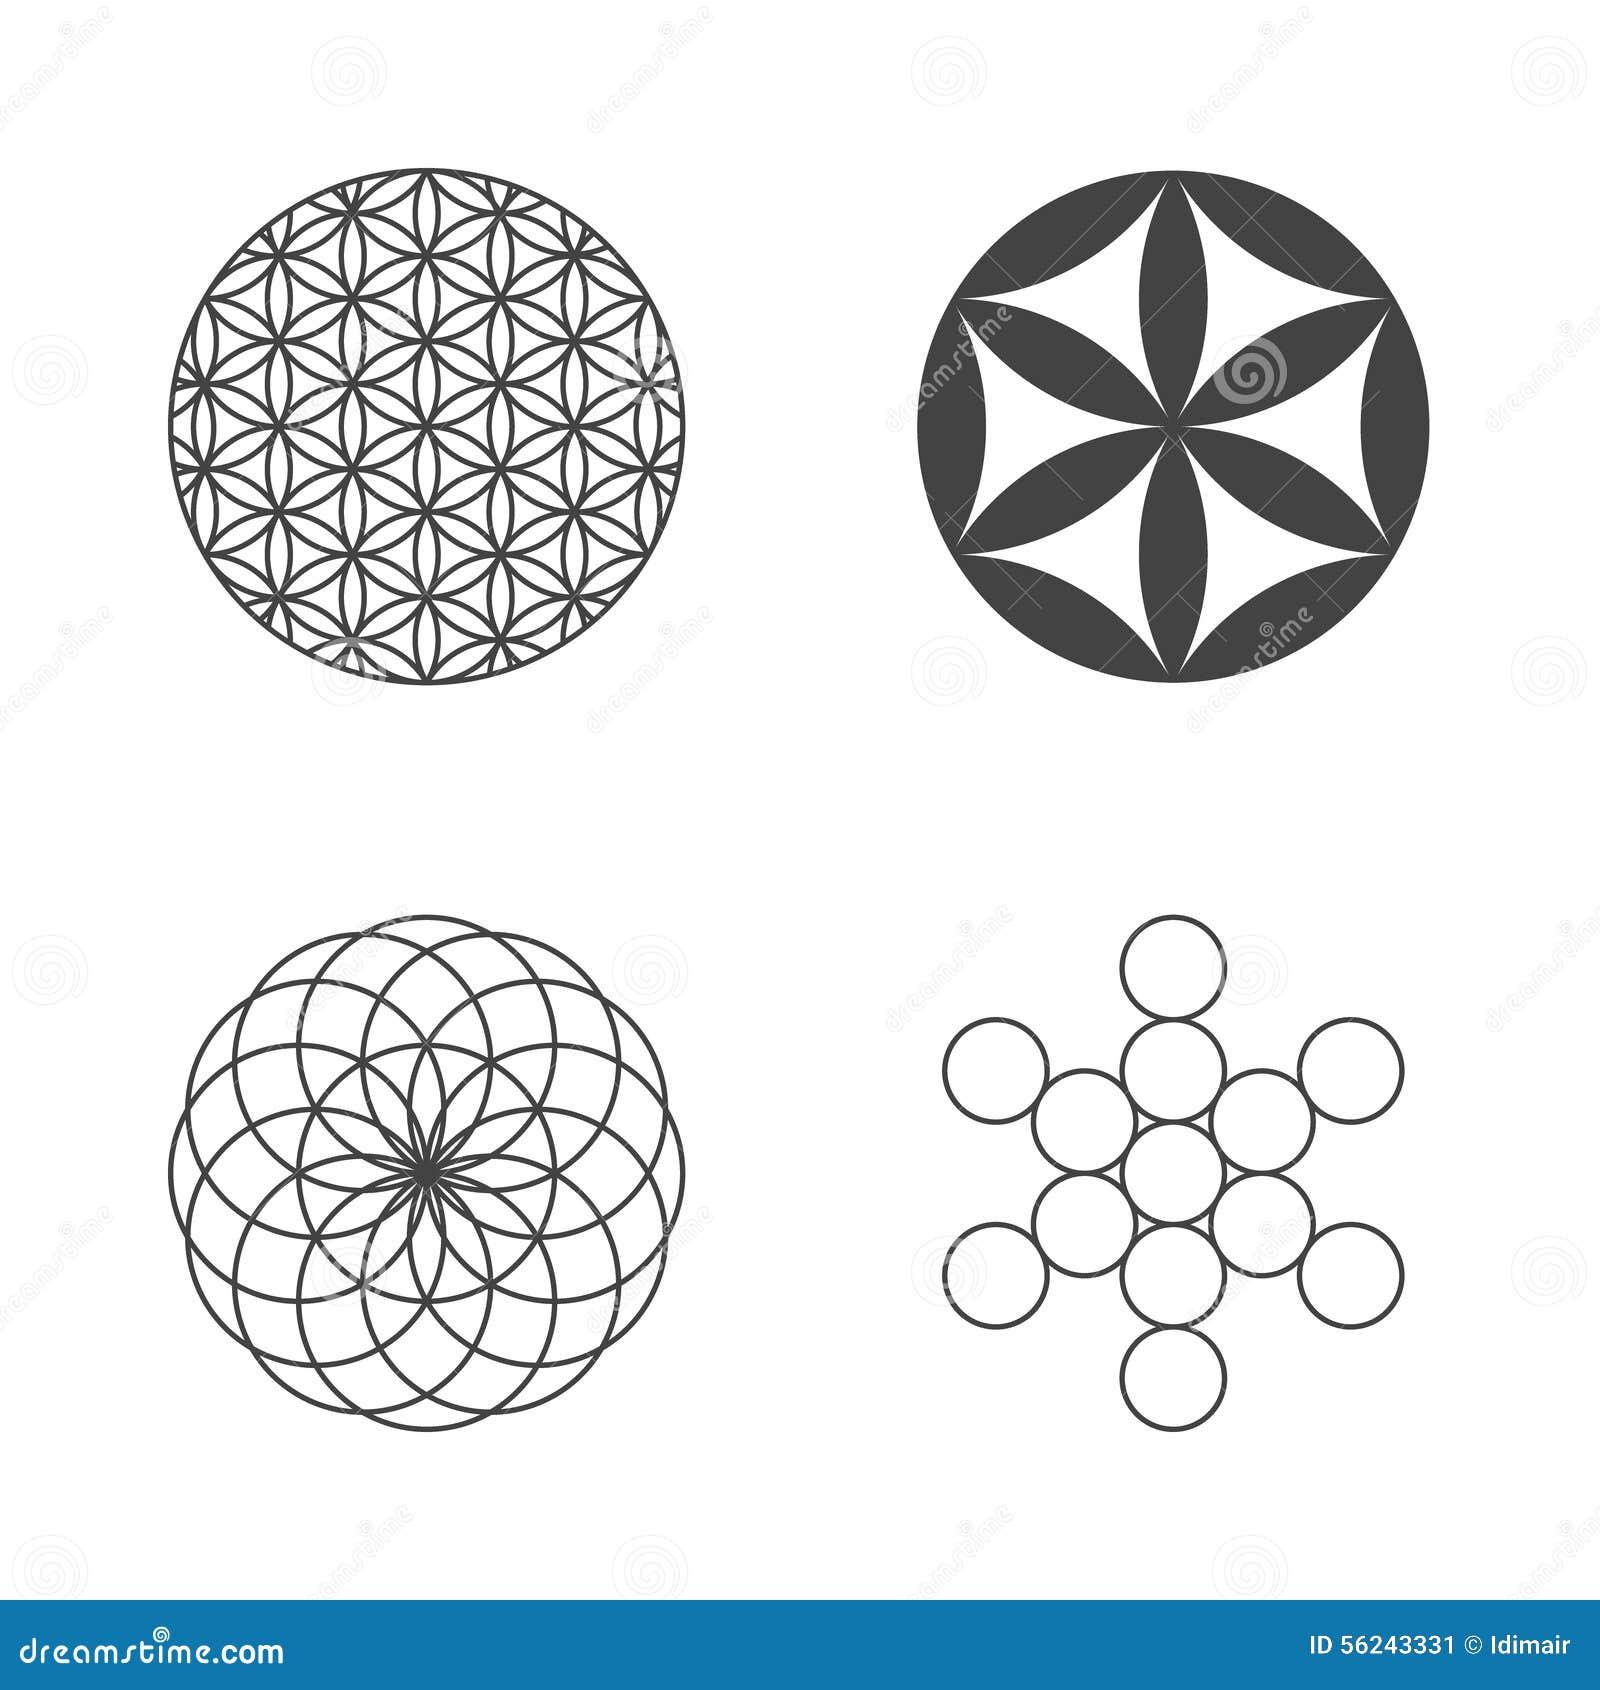 flower of life set of icons design elements stock vector image 56243331. Black Bedroom Furniture Sets. Home Design Ideas